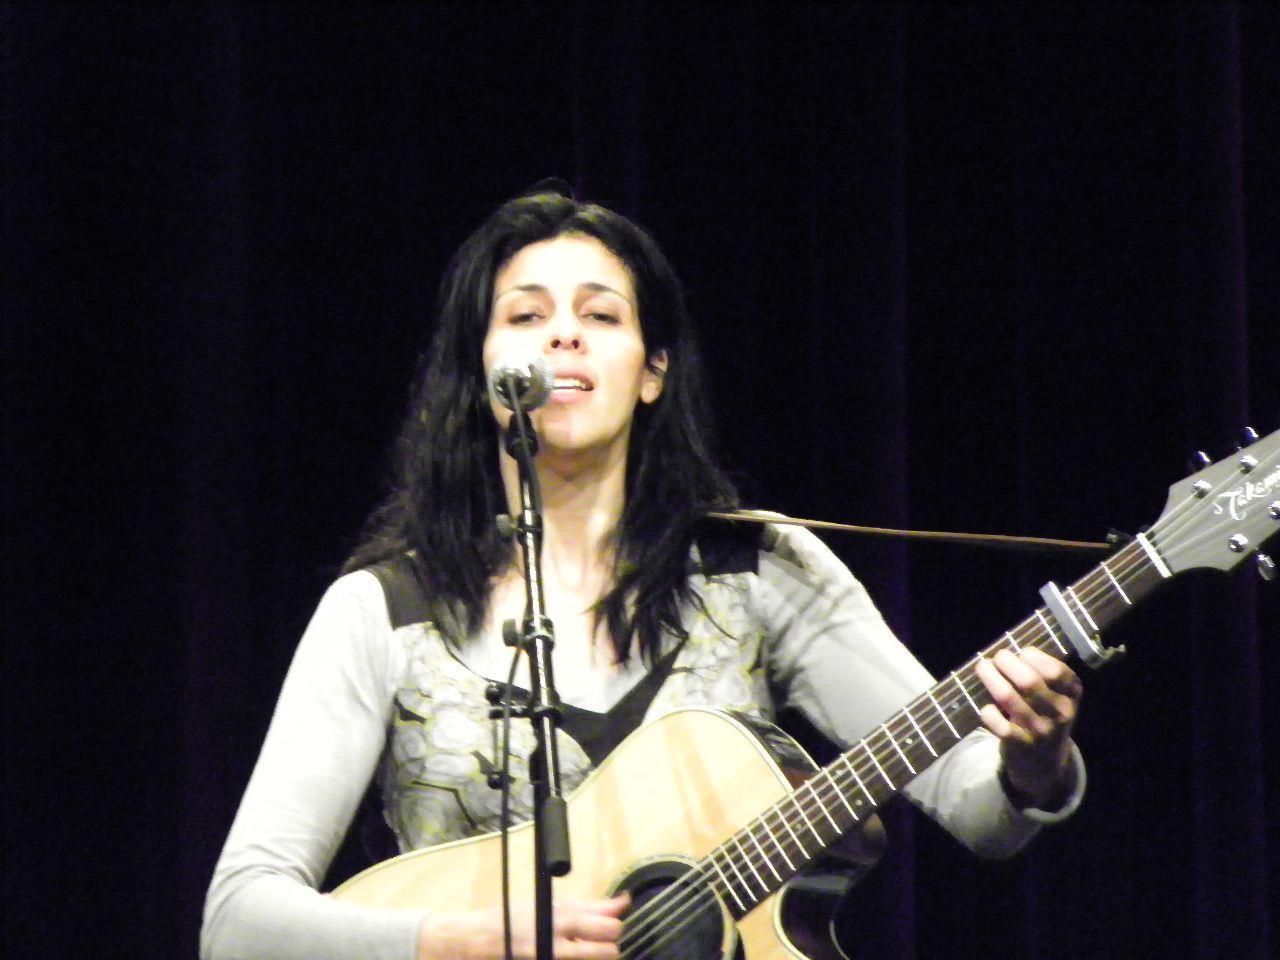 Sängerin Souad Massi